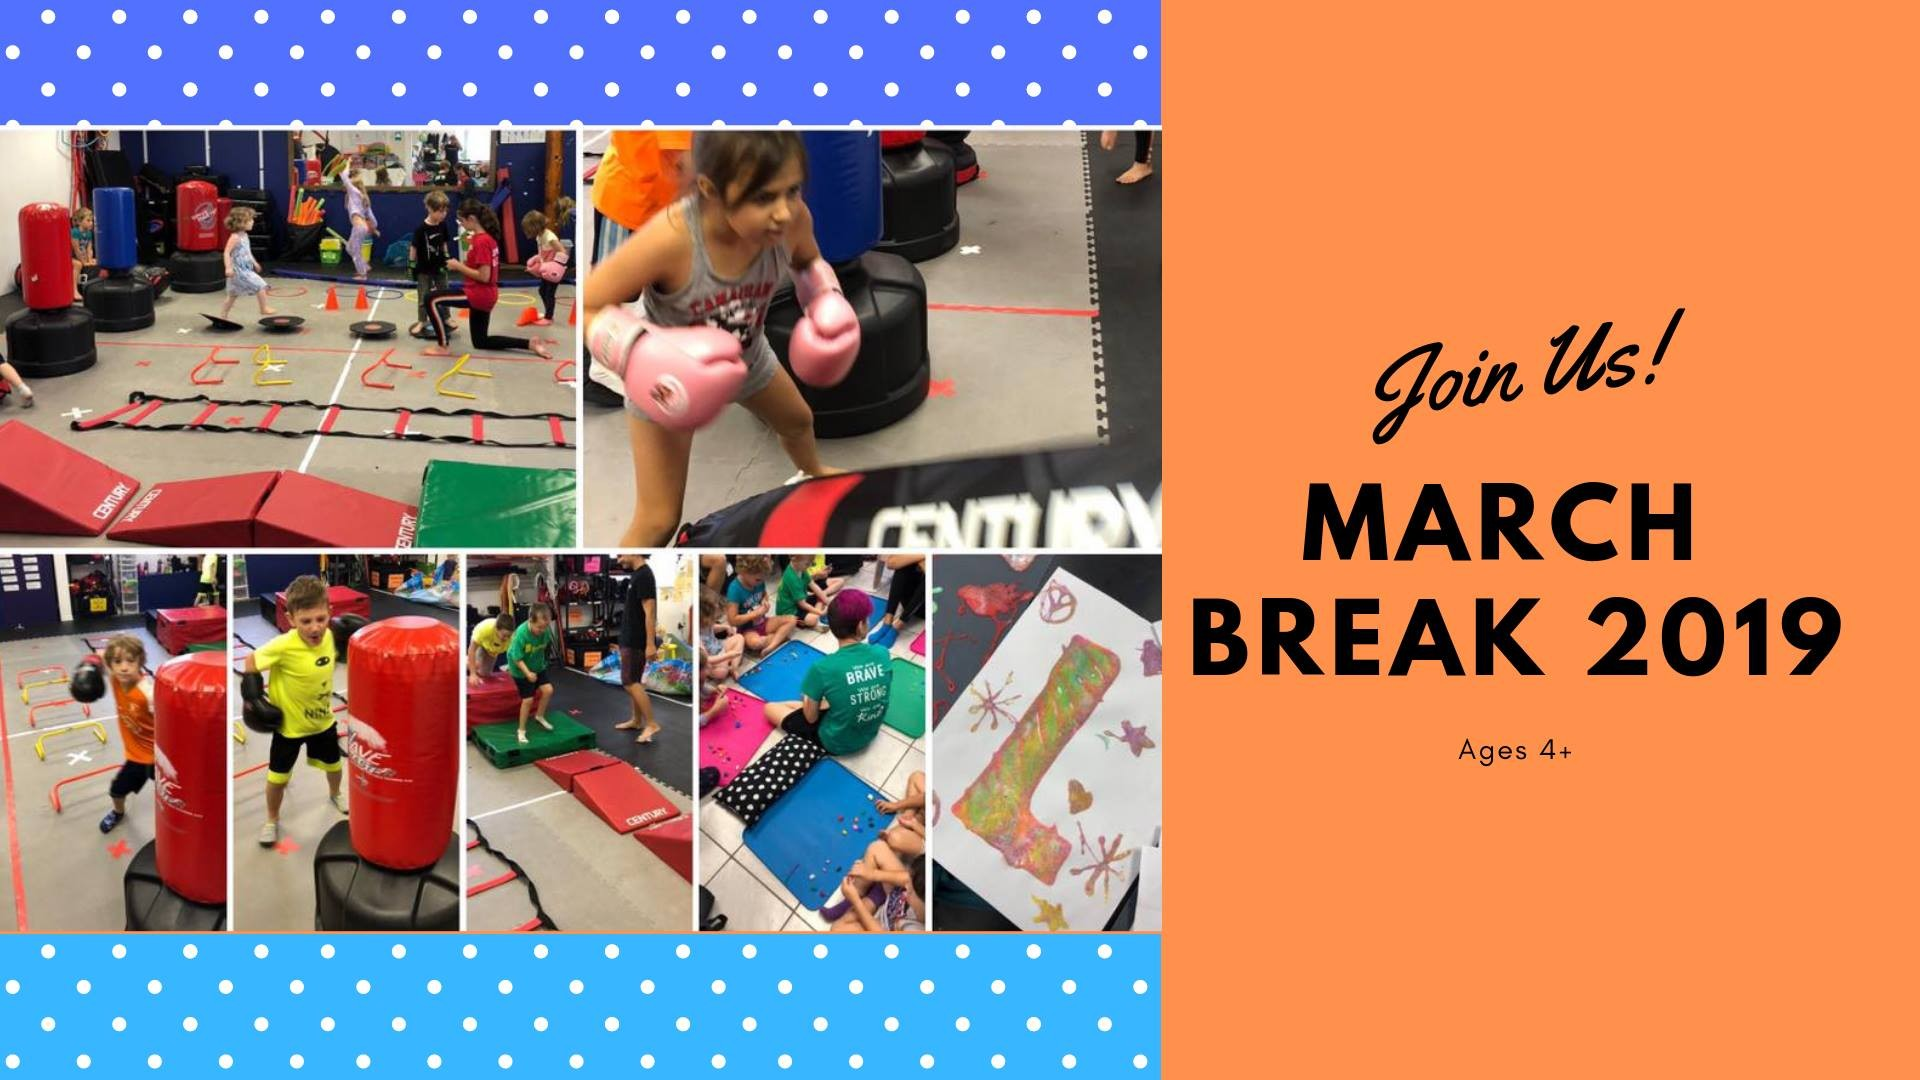 March Calendar 2019 Actual March Break 2019 Determination Martial Arts Hamilton [from 11 to Of March Calendar 2019 Mejores Y Más Novedosos 30 Day Calendar Template Awesome Calendar 1 April 2018 to 31 March